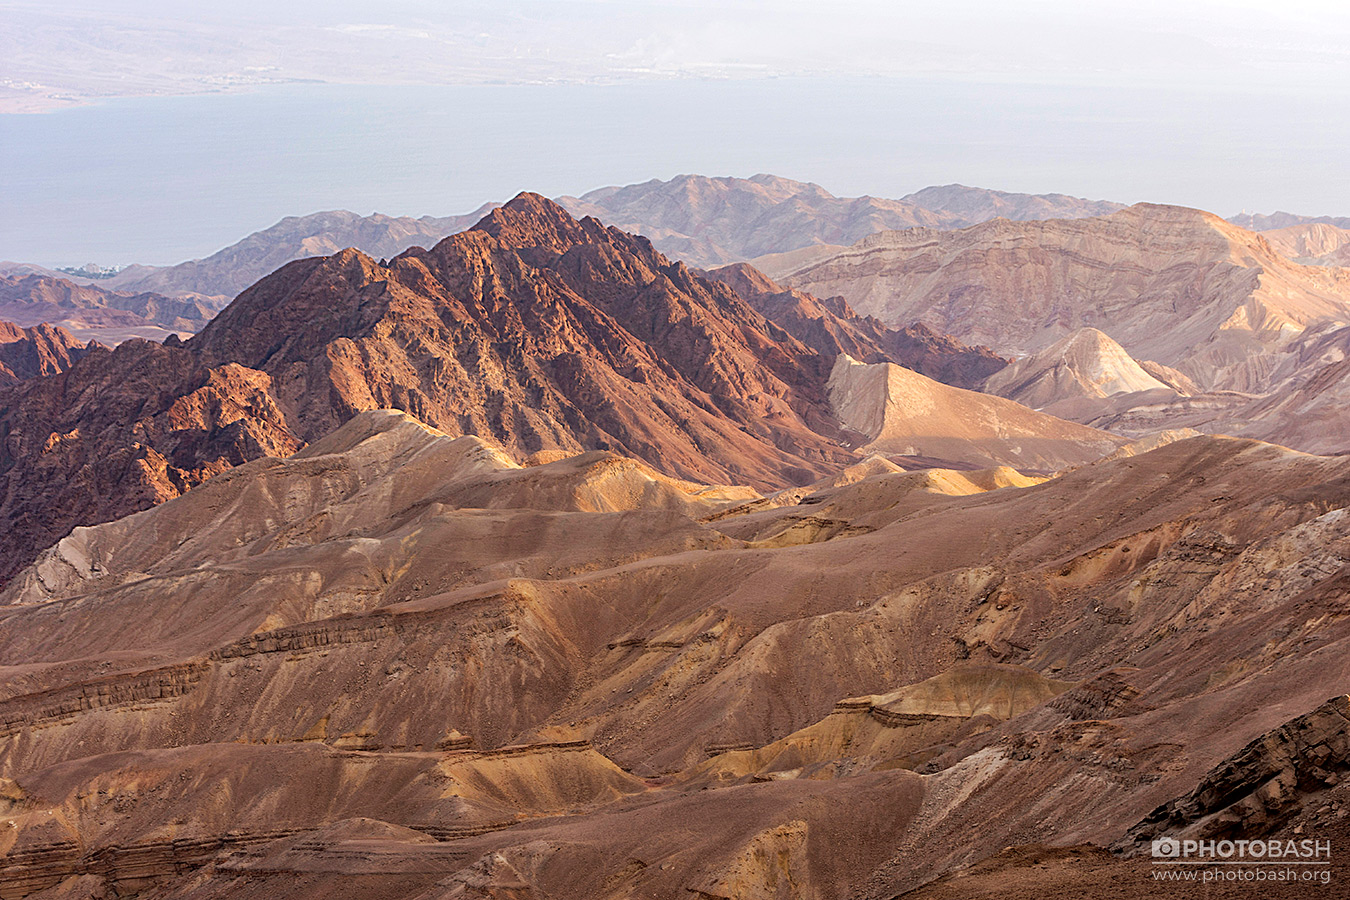 Eilat-Desert-Arid-Landscape-View.jpg